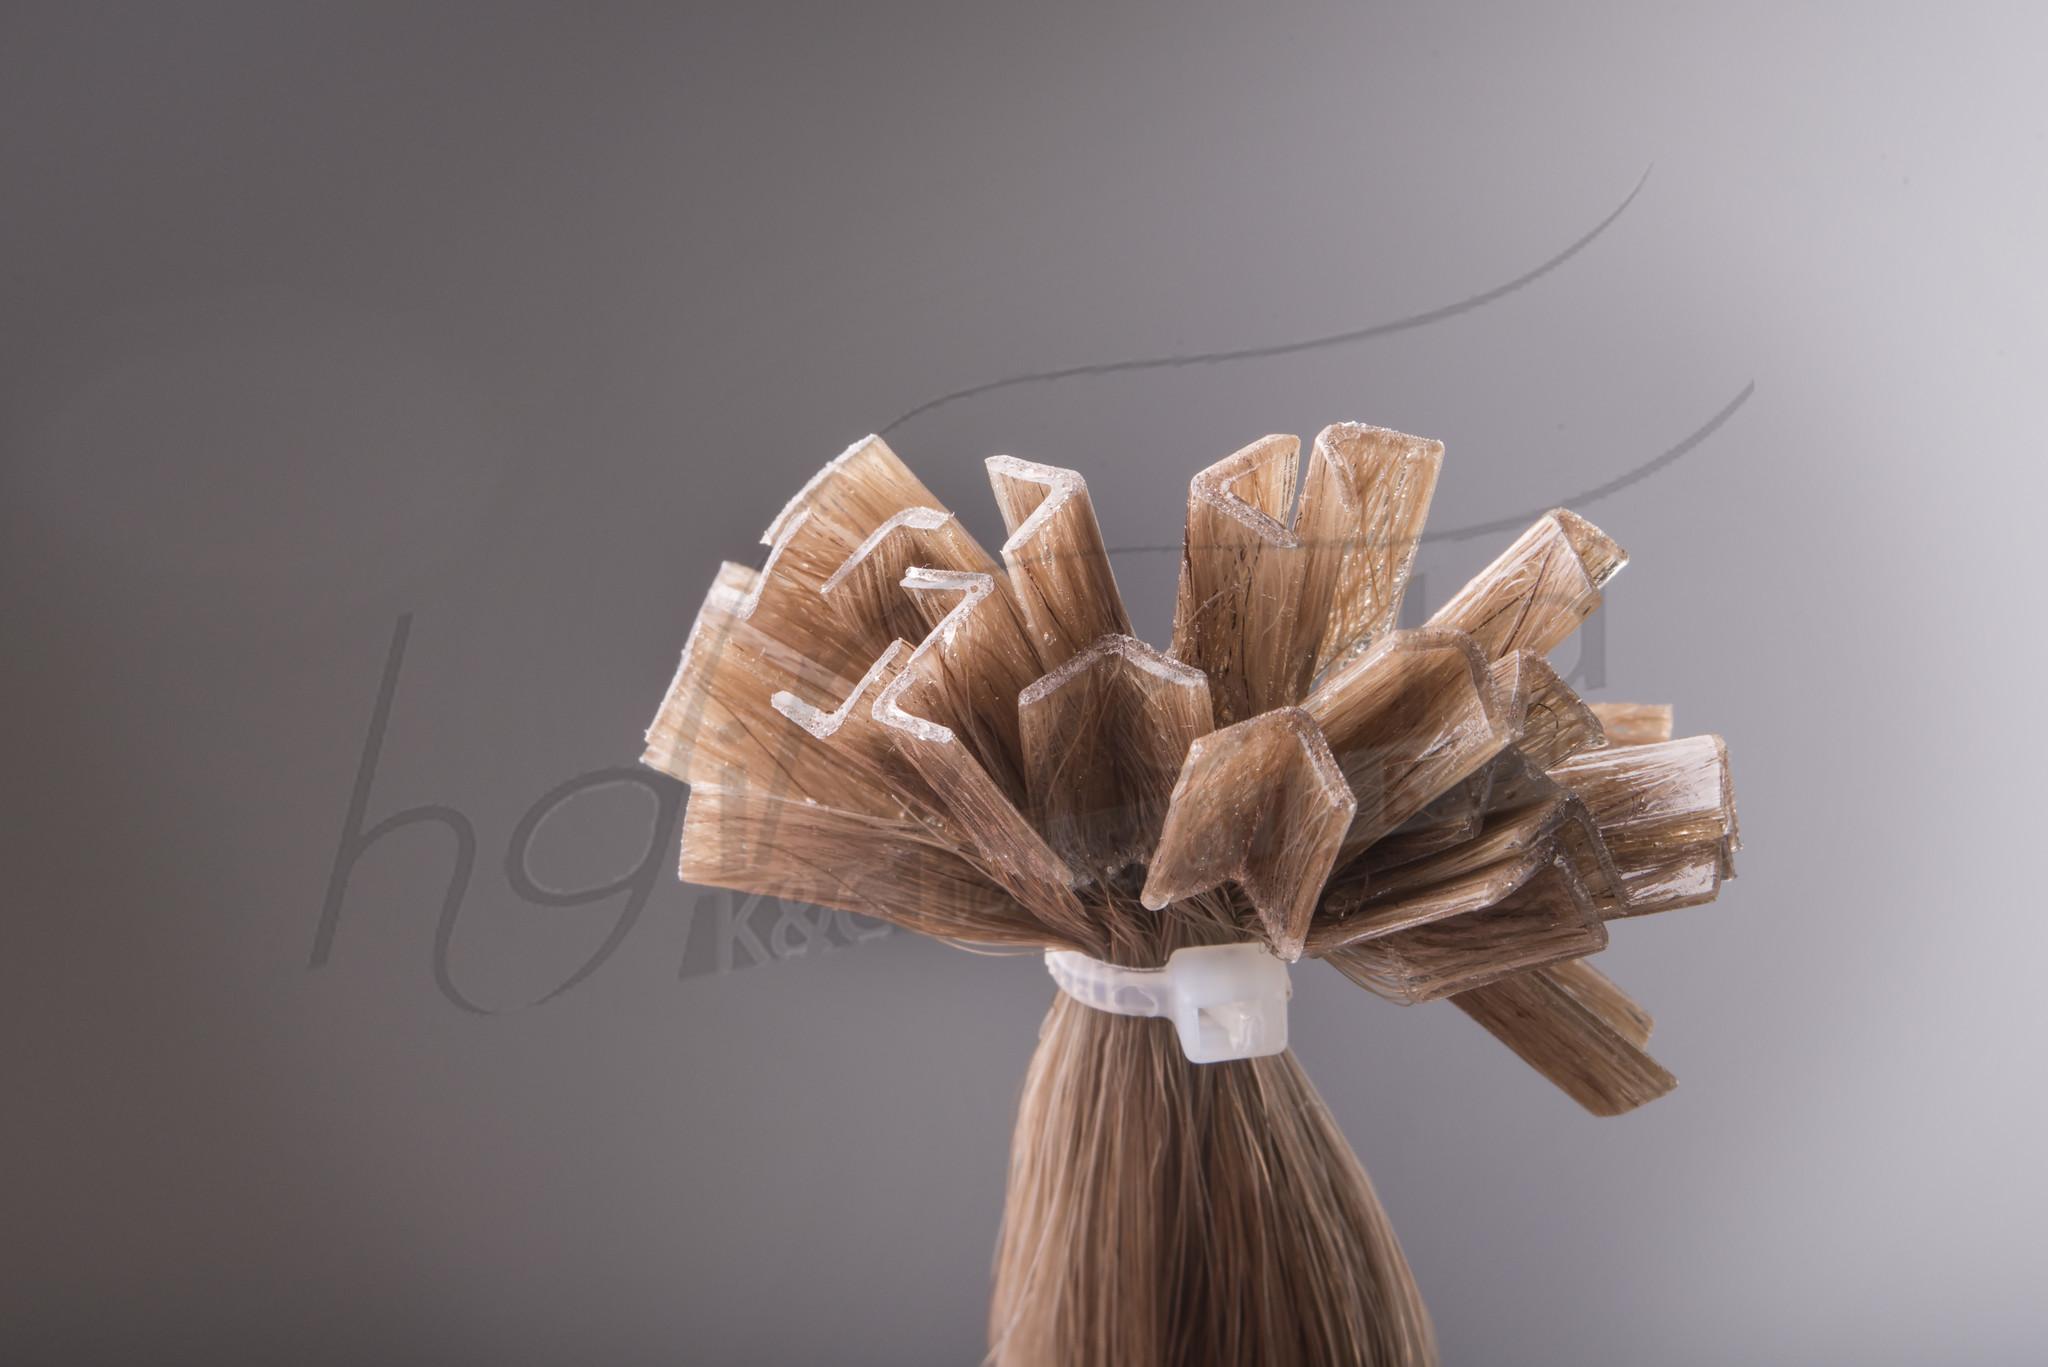 SilverFox Wax Extensions Deep Wave 55cm  #24 Warm Light Blonde